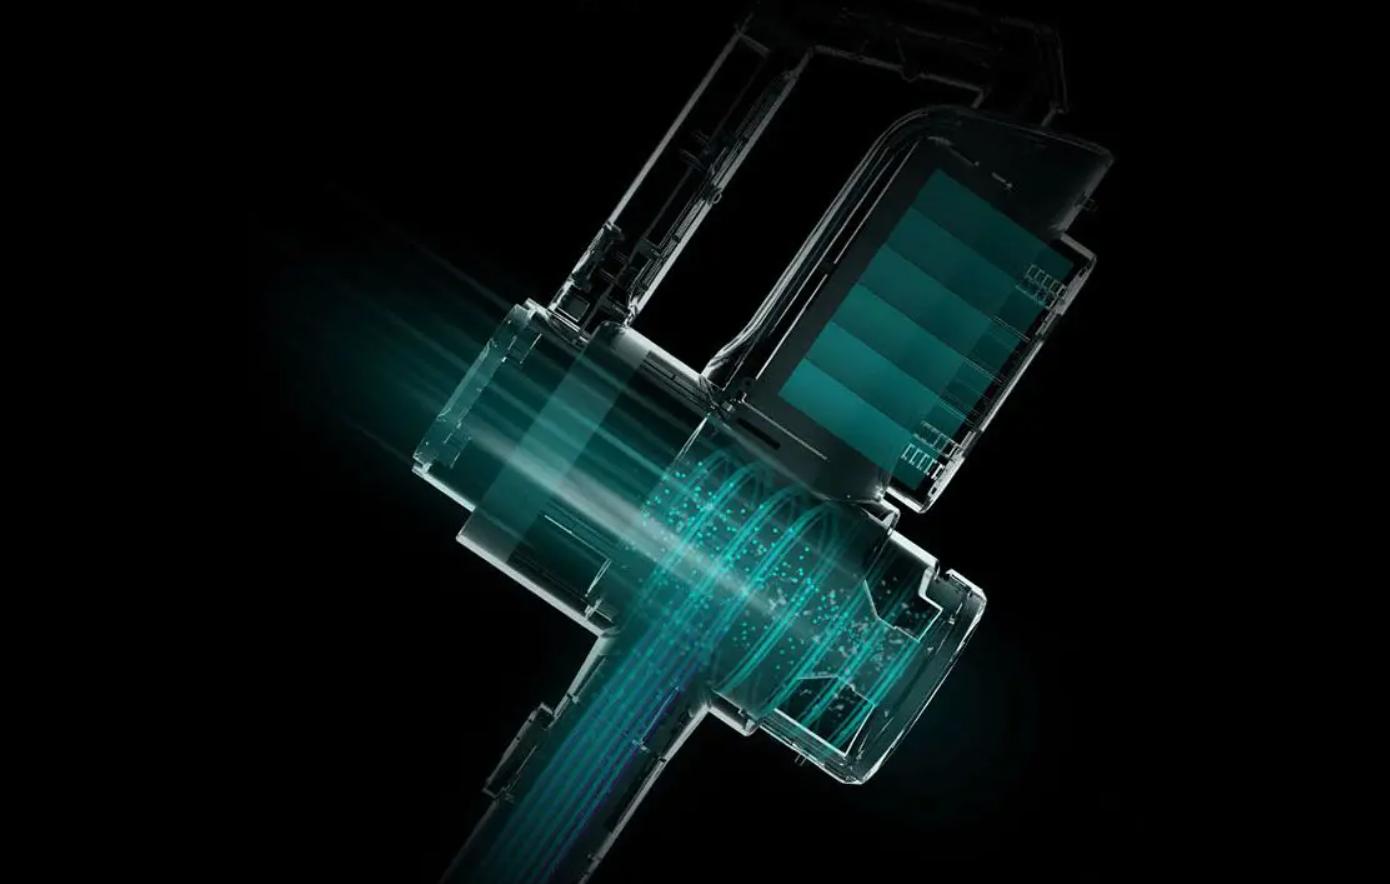 Opisanie Besprovodnoj Ruchnoj Pylesos Xiaomi Deerma Wireless Vacuum Cleaner Vc40 3